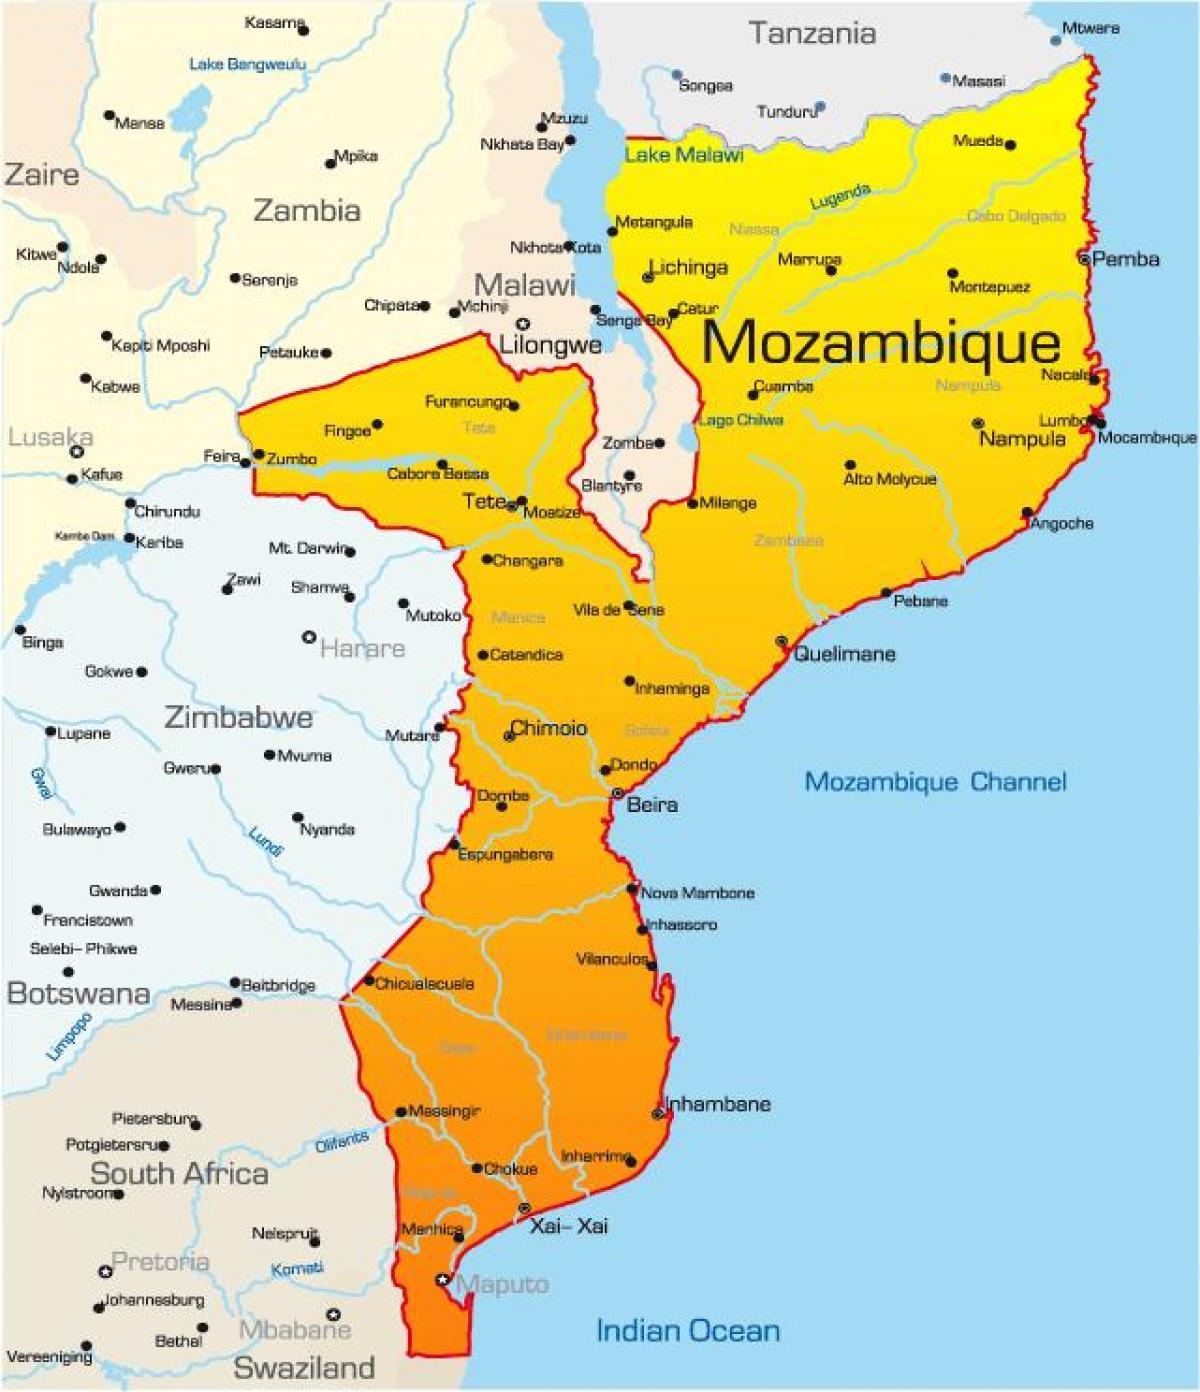 el mapa de Mozambique